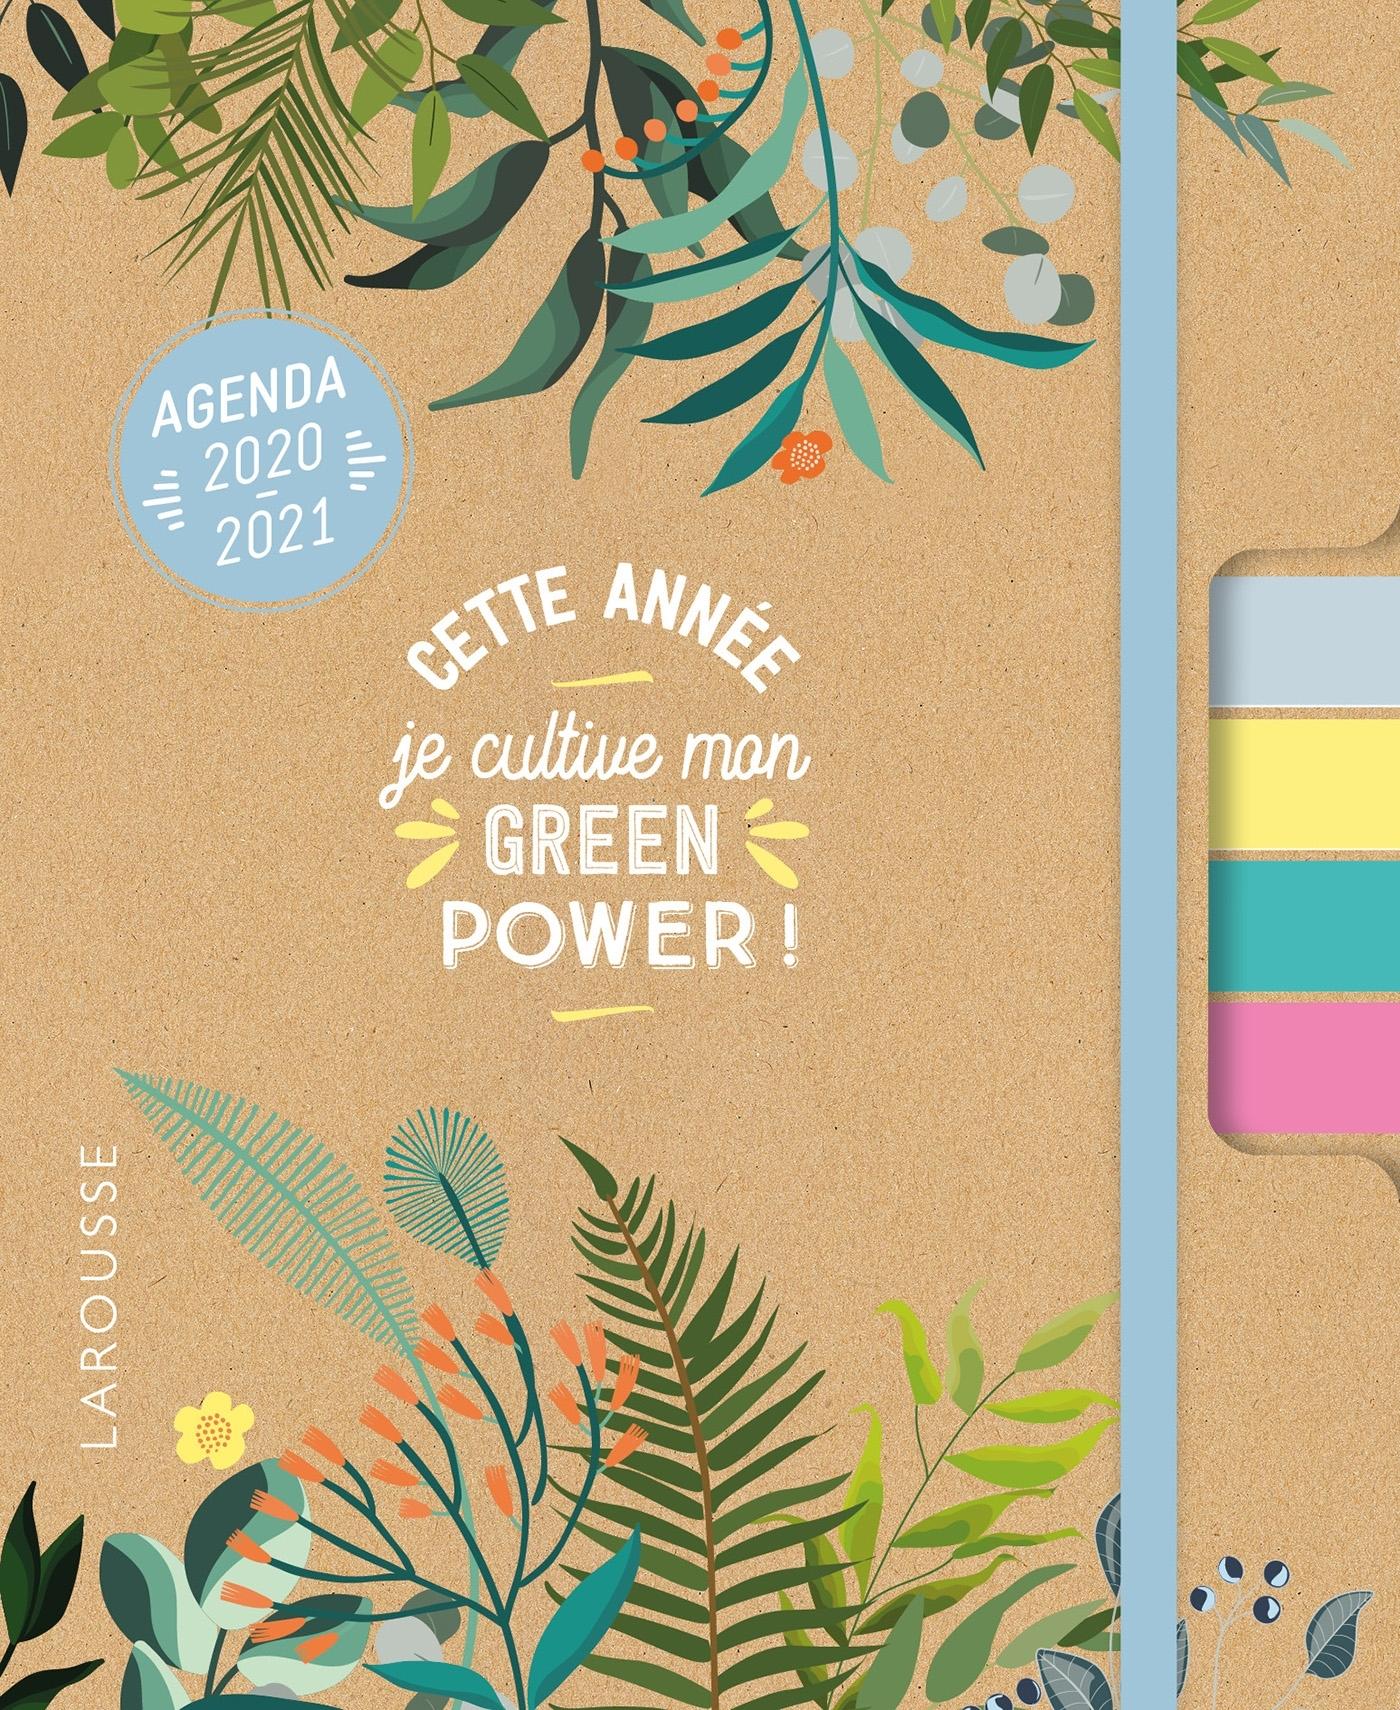 GREEN AGENDA 2020-2021